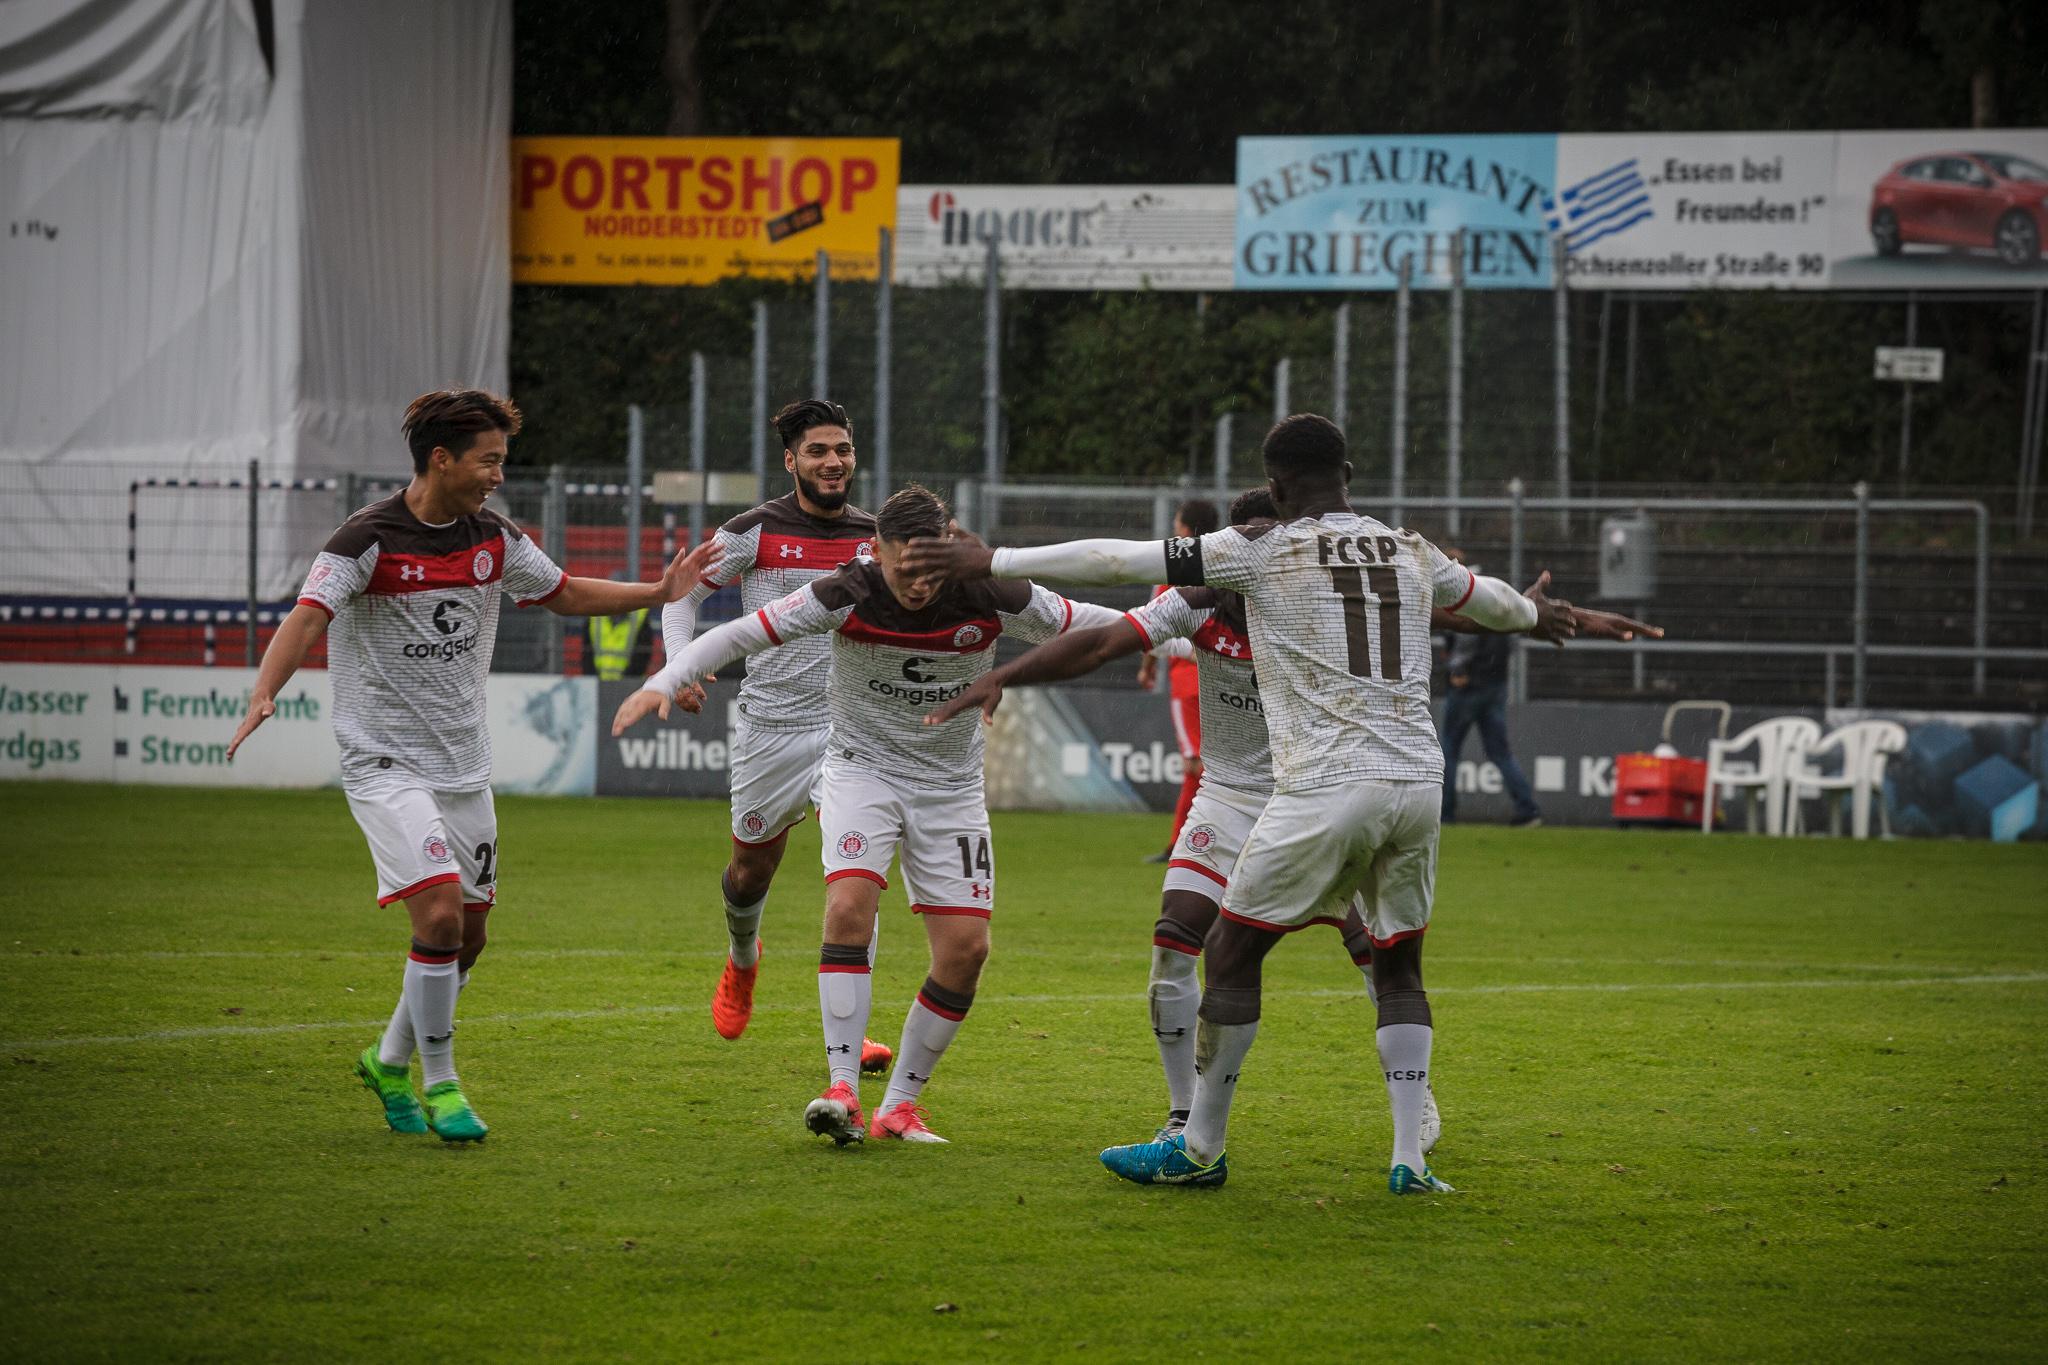 U23 empfängt den LSK - Kiezkicker wollen dritten Sieg in Serie